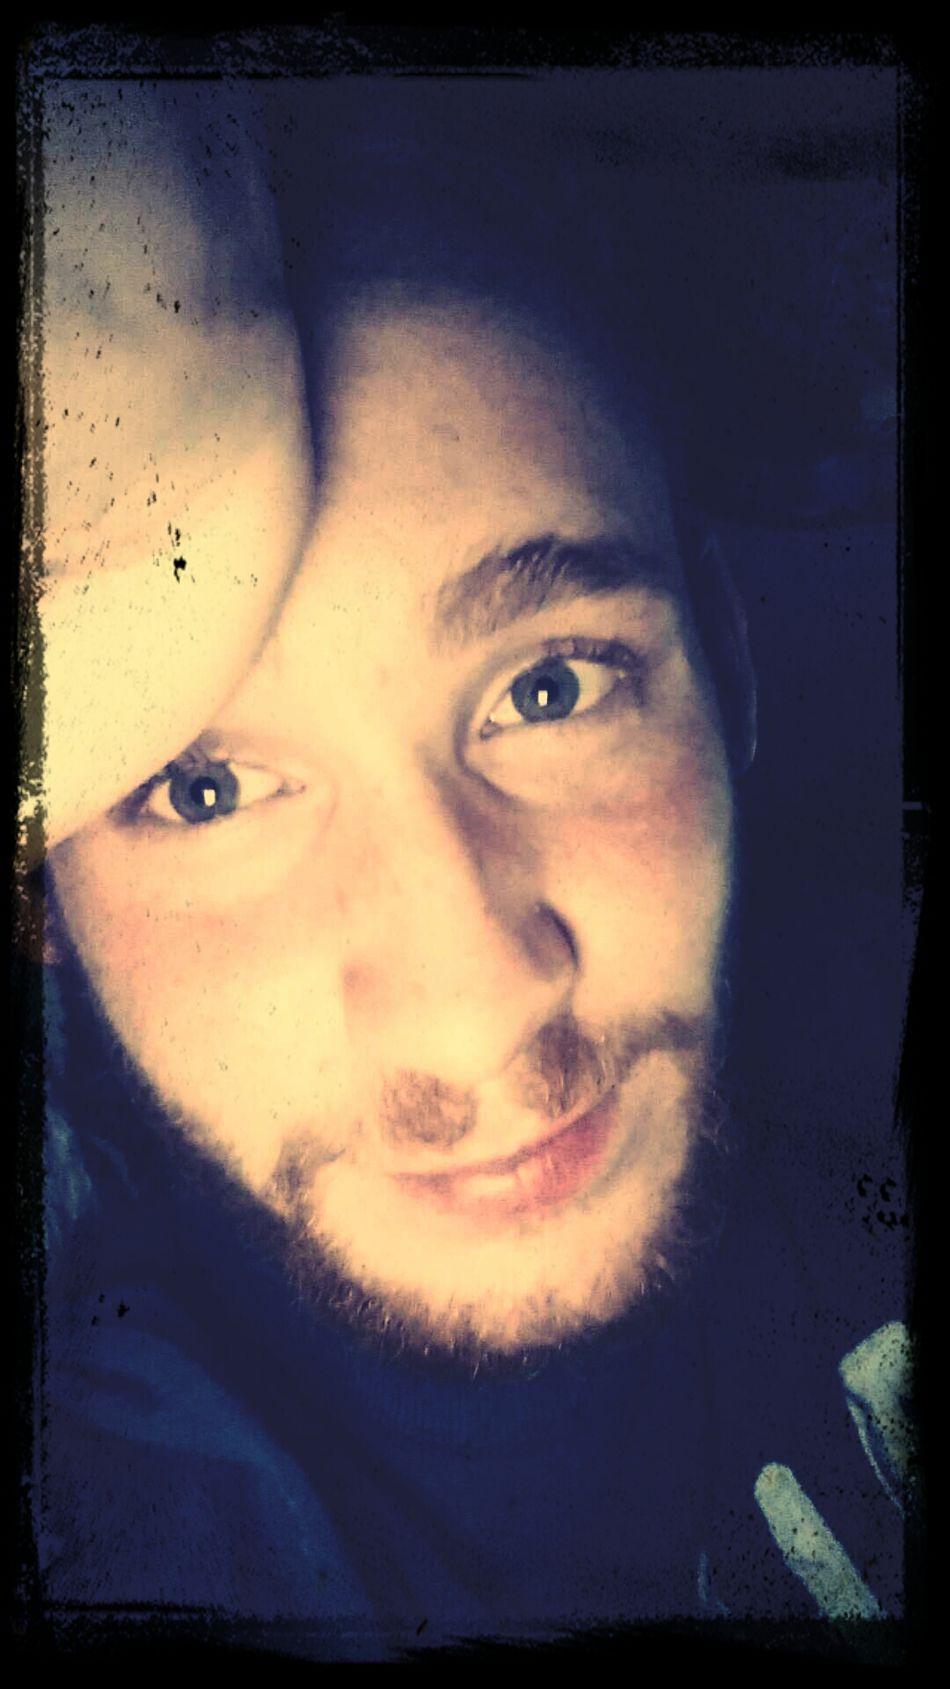 Bored everynight, snapchat me kidwilli832 Snapchat Me Sexy Me Selfie KingwoodTexas